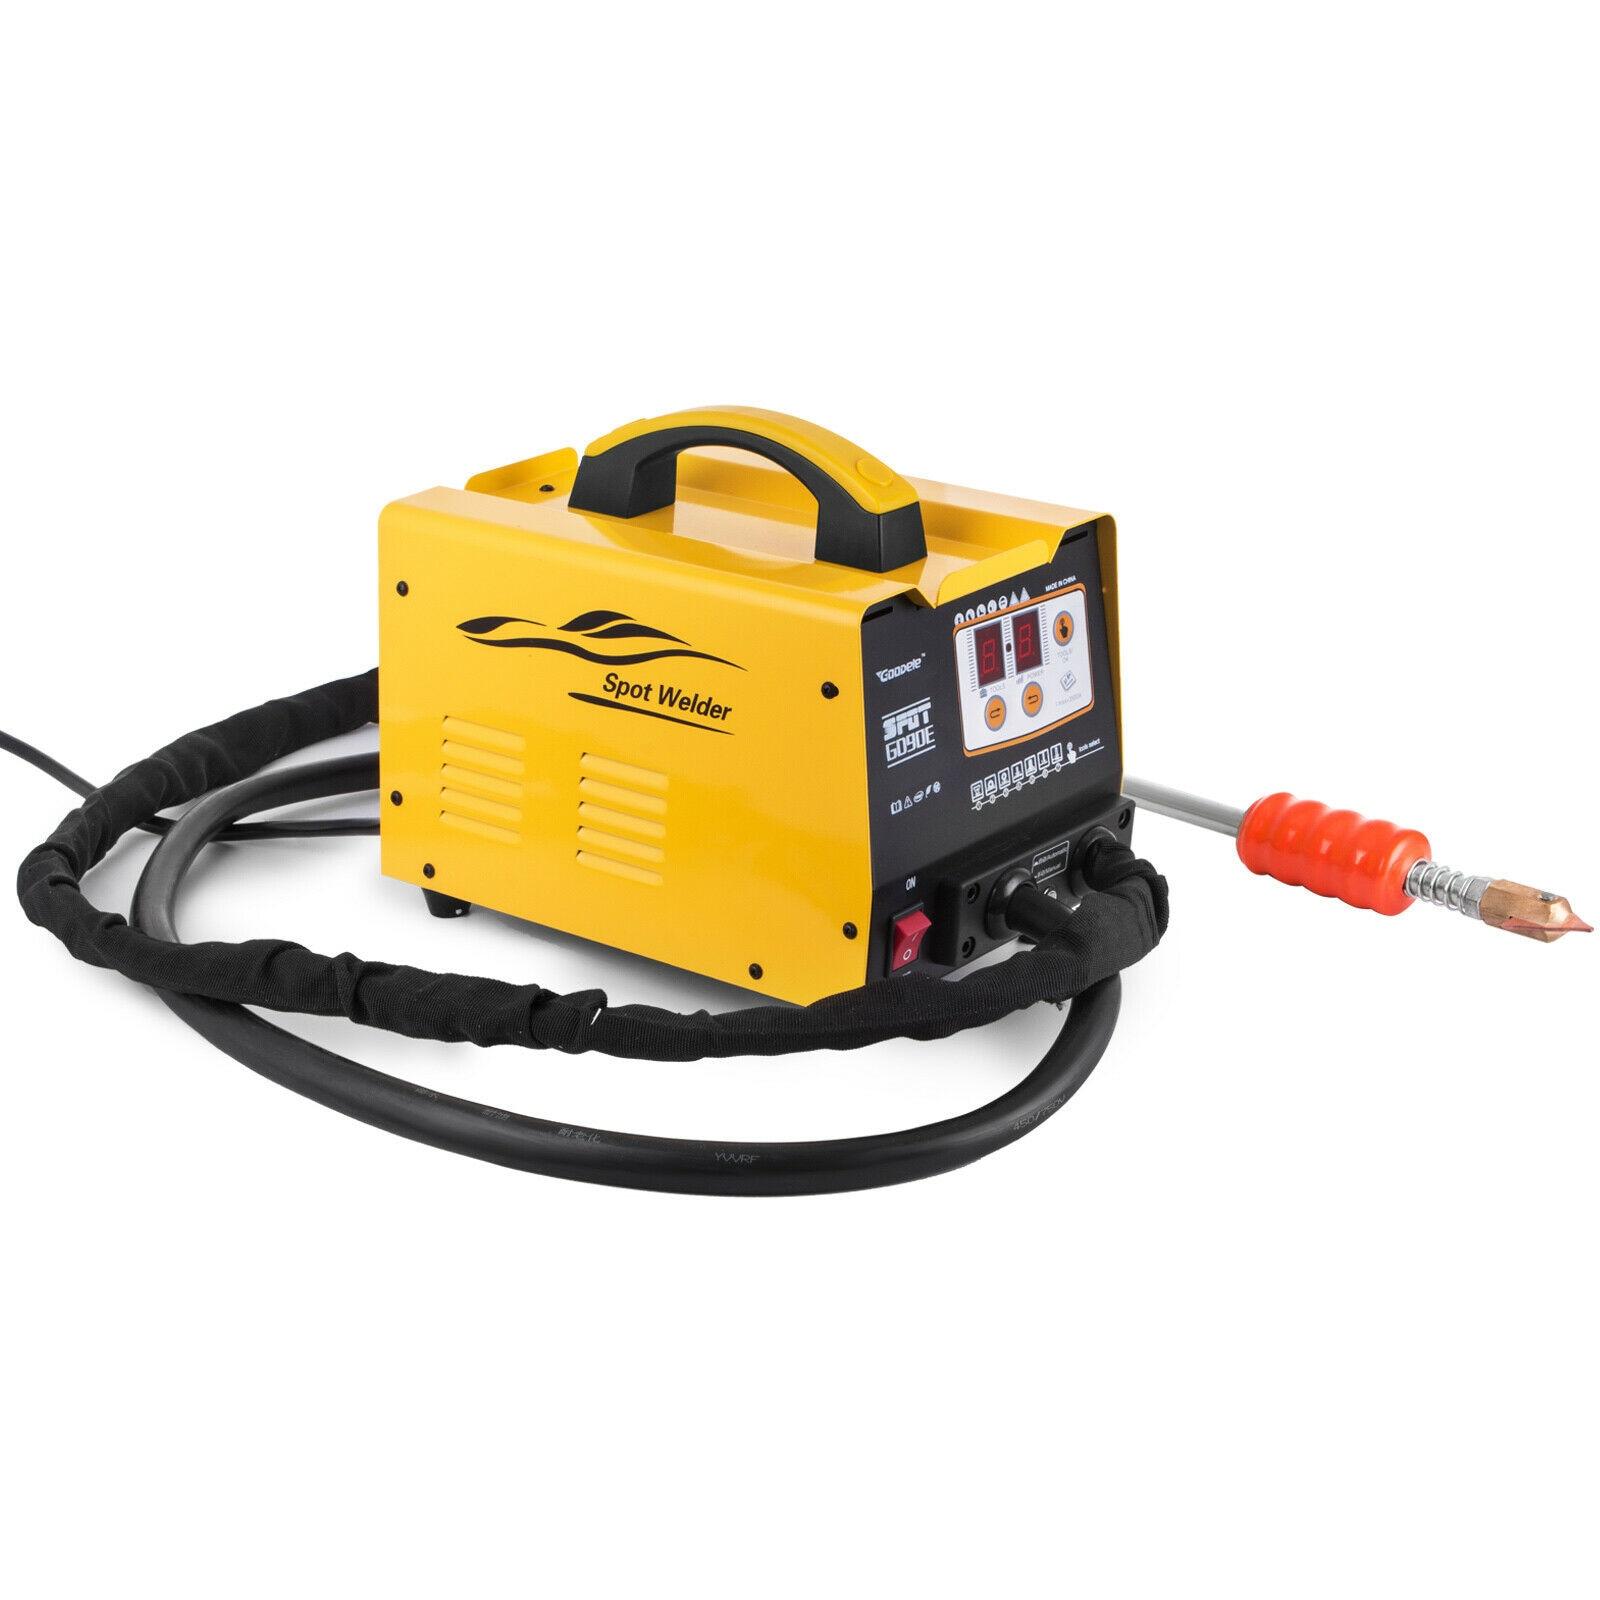 G90E Dent Reminder Car Tool Dent Repair Spotter Welding Machine 220V Welder